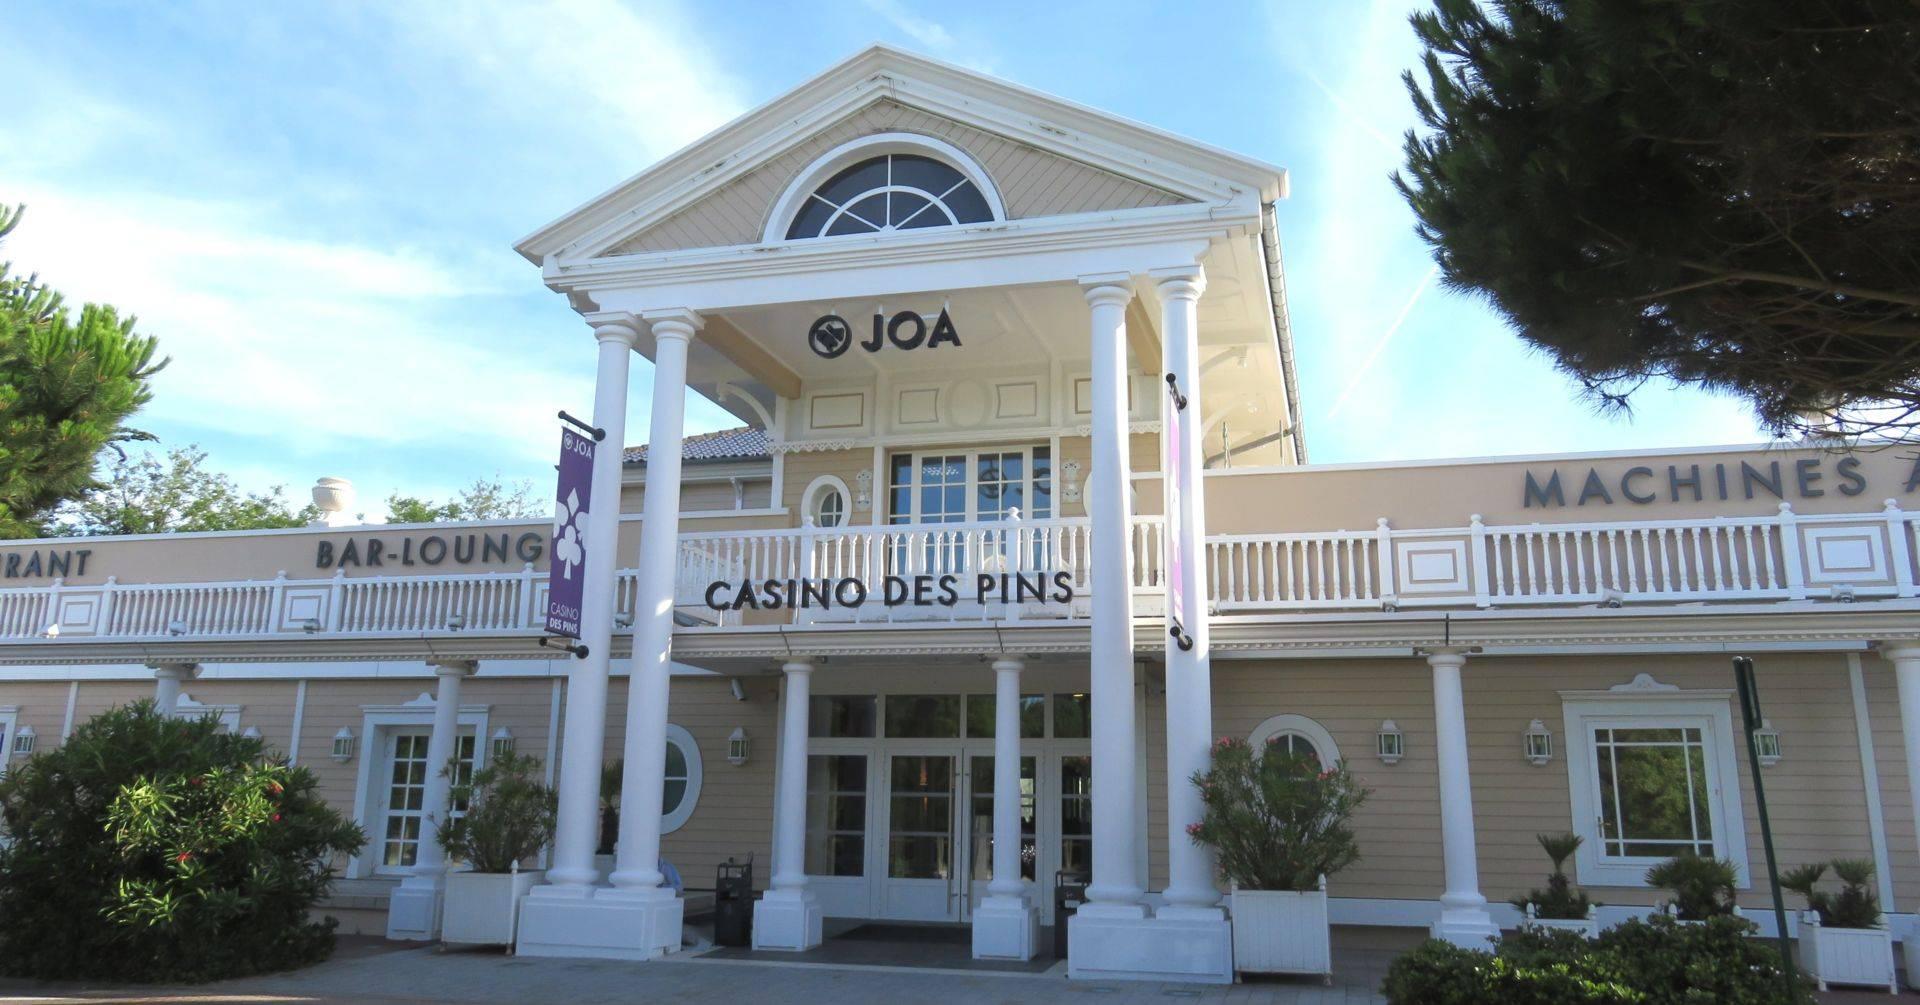 Jose xavier poker